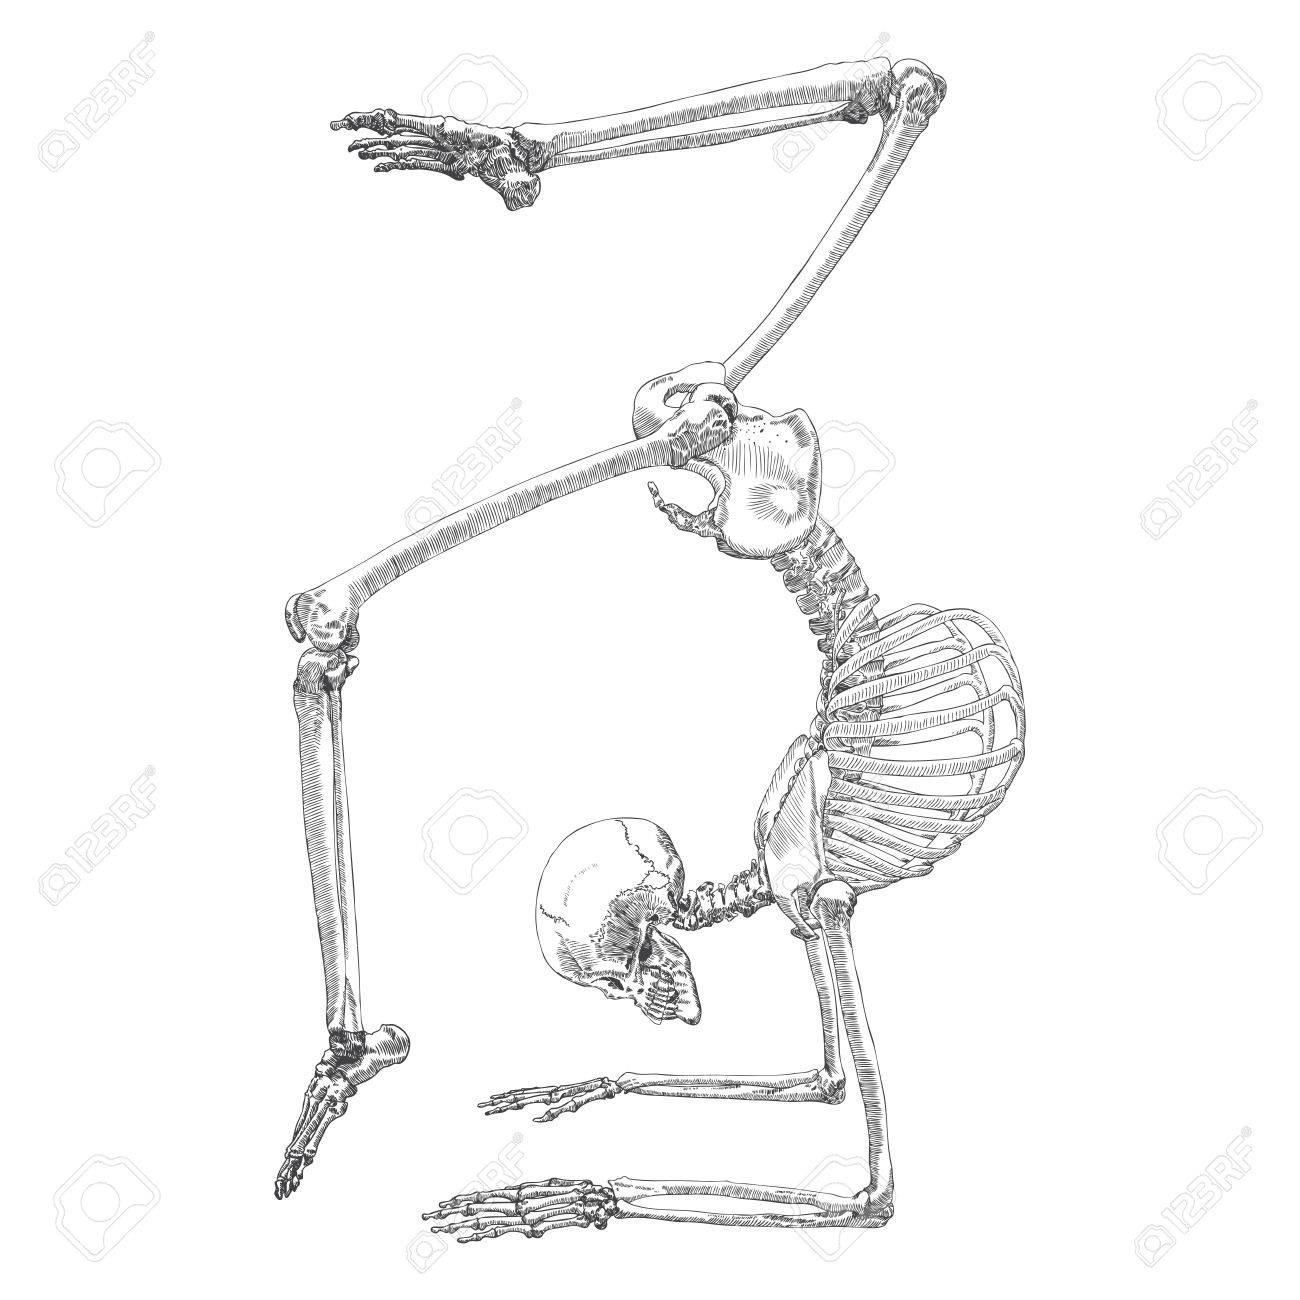 Los Huesos Humanos De Dibujo Esqueleto. Bailar O Hacer Gimnasia. Con ...